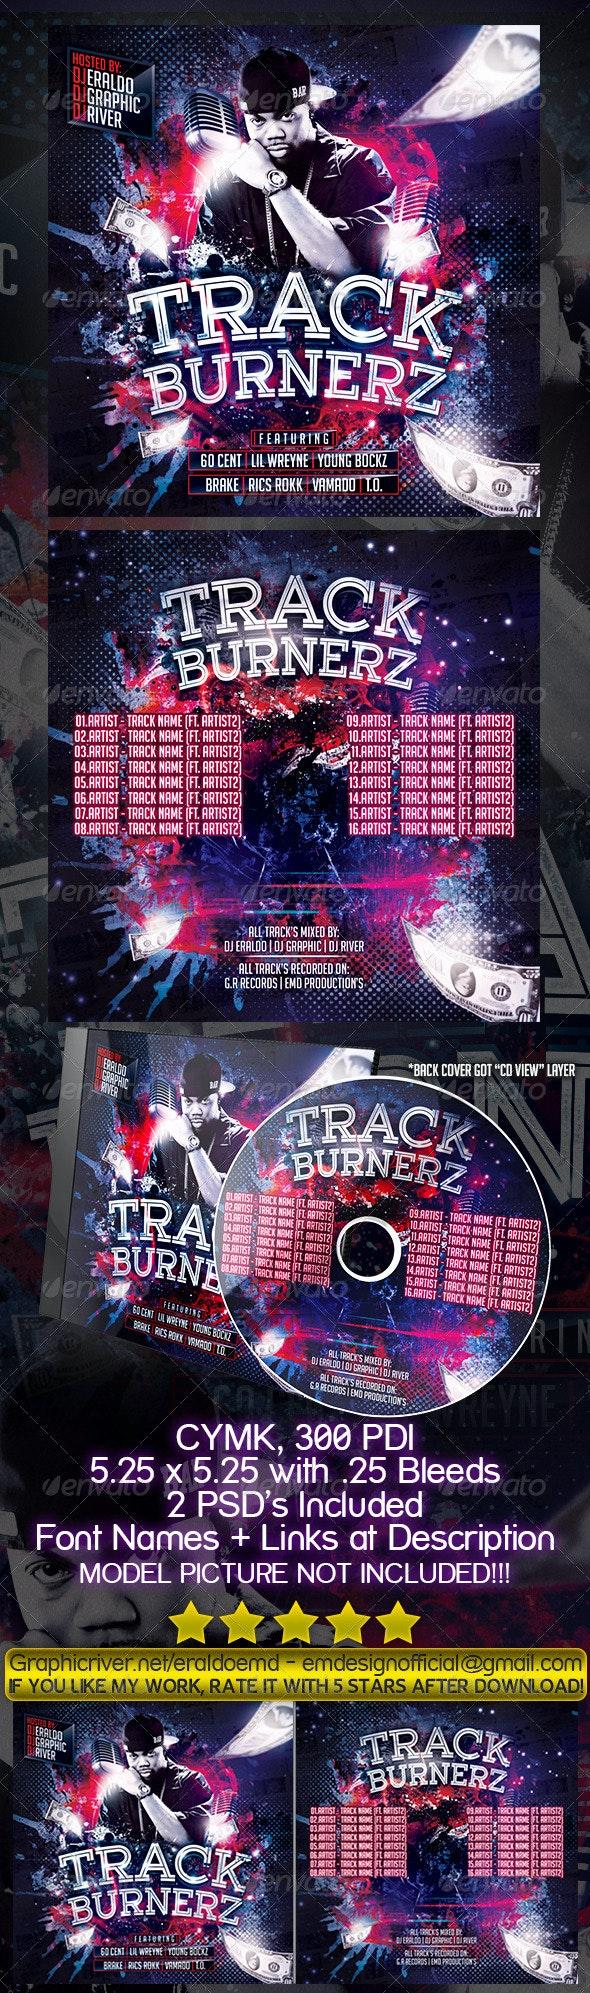 Underground Mixtape Cover Track Burnerz - CD & DVD Artwork Print Templates